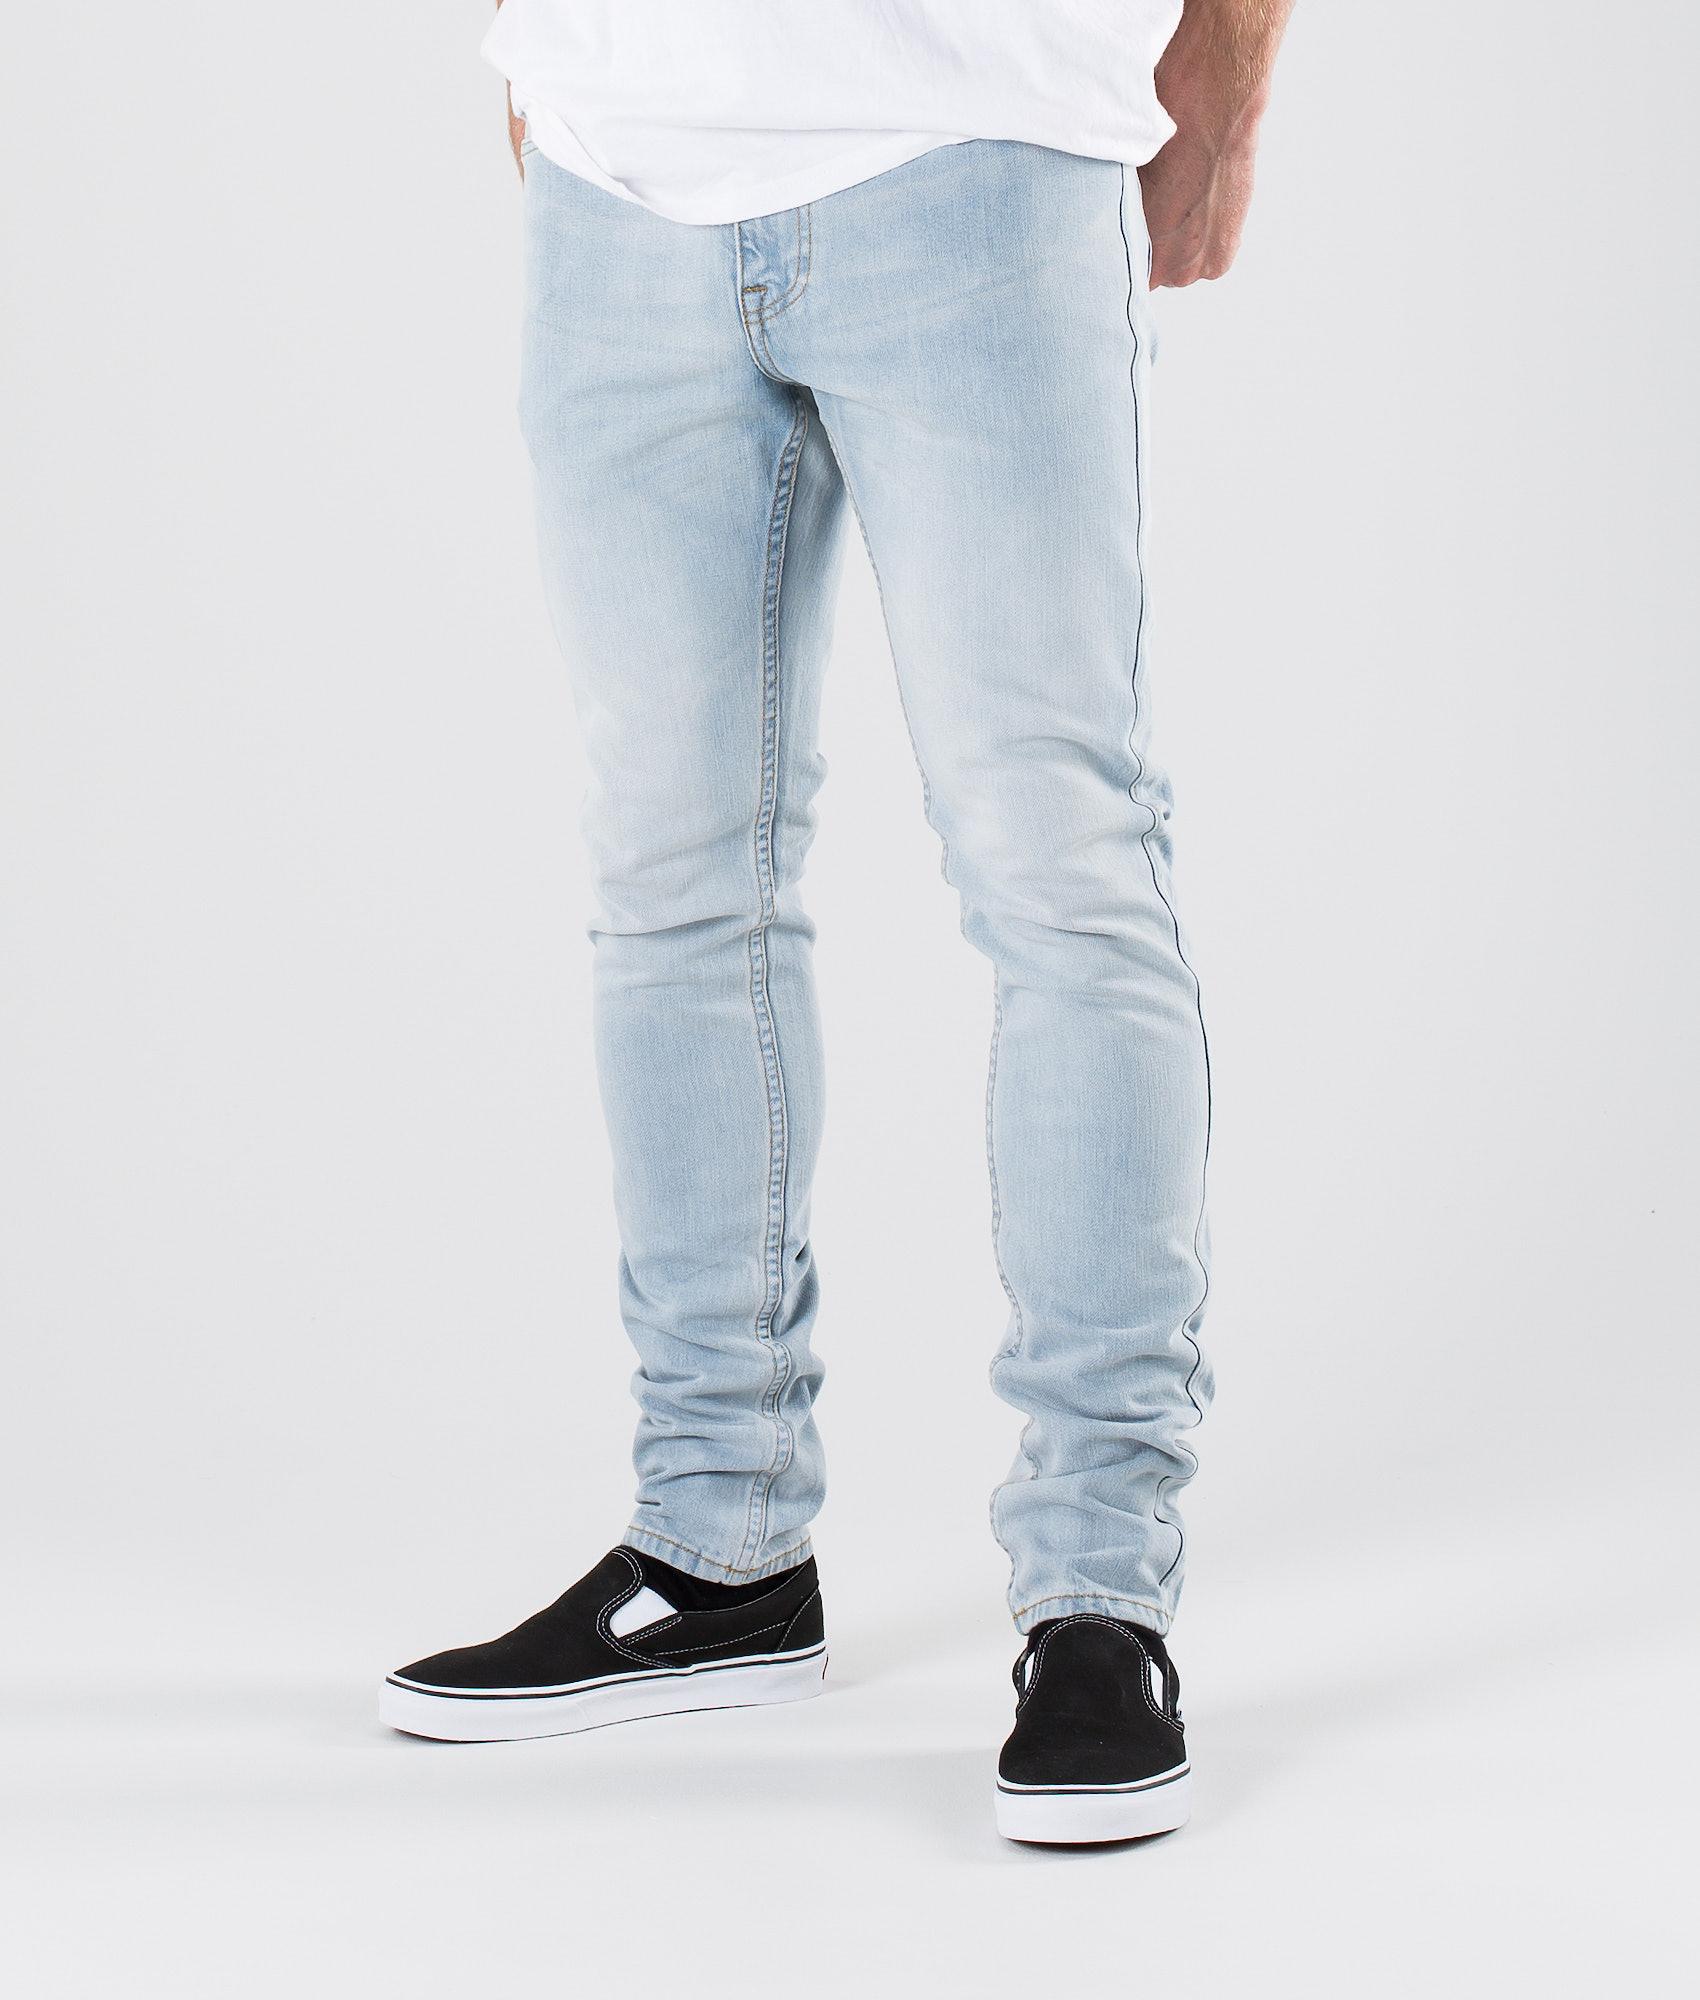 5ebce066 Byxor & Jeans Herr Streetwear | Fri Frakt | Ridestore.se